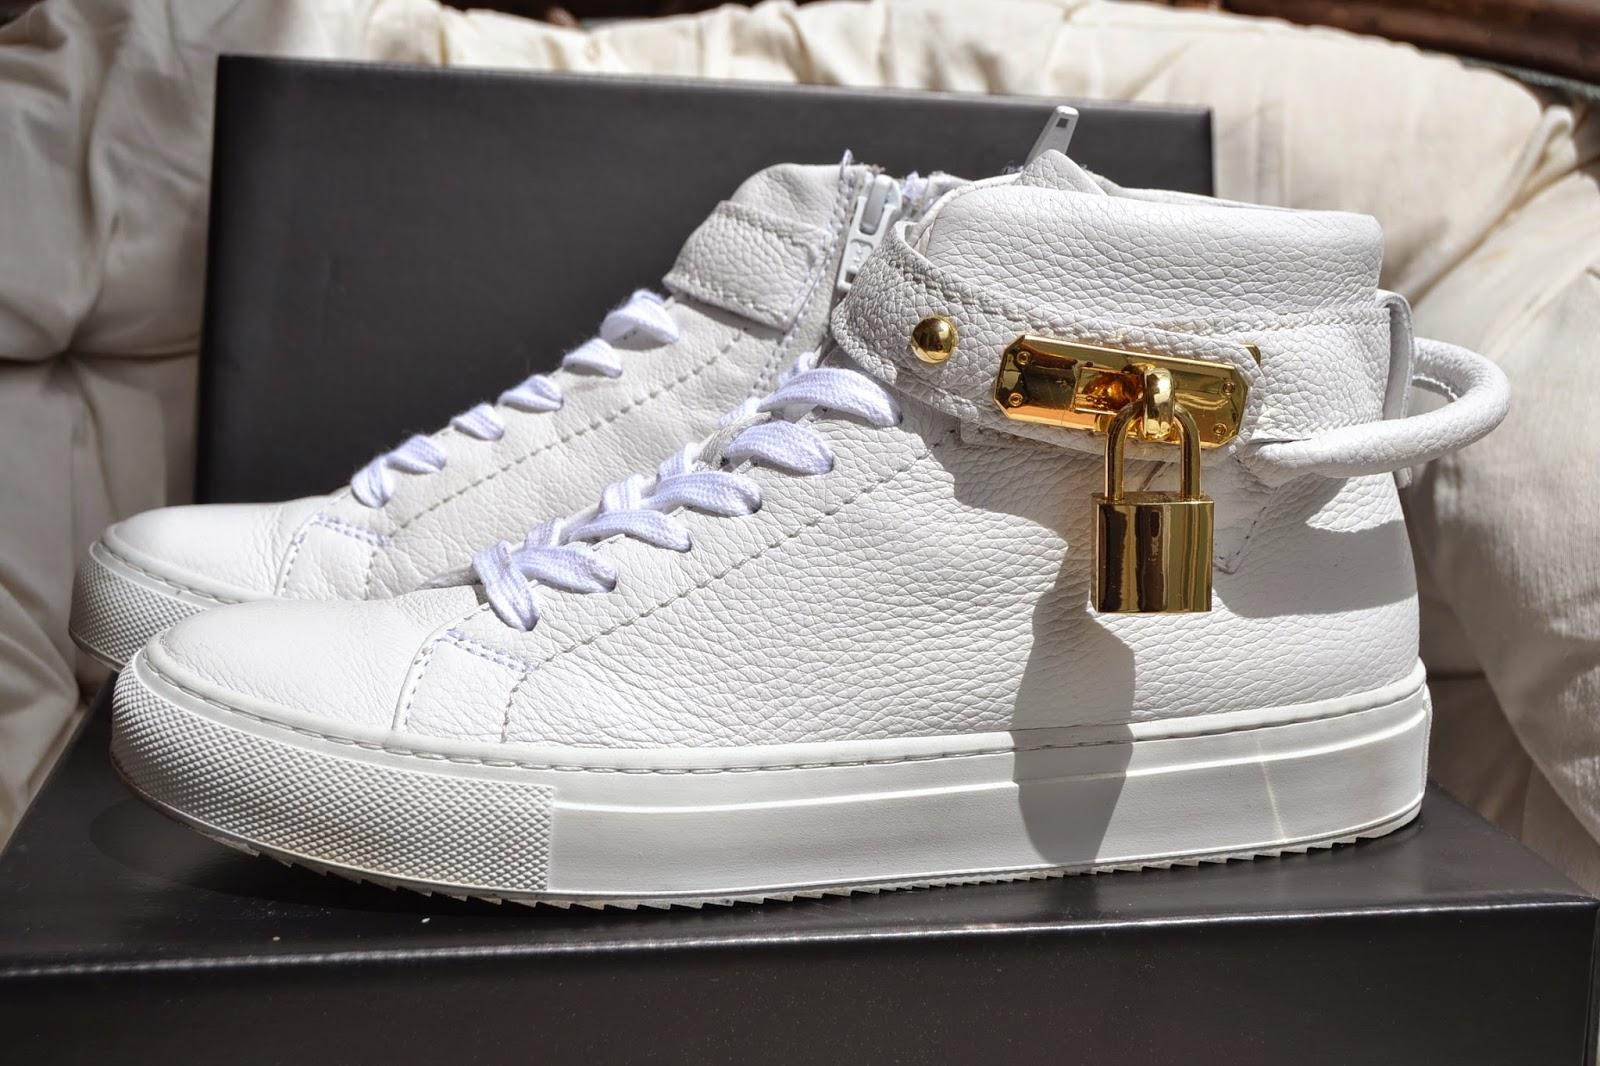 http://www.syriouslyinfashion.com/2014/05/birkin-style-shoes.html